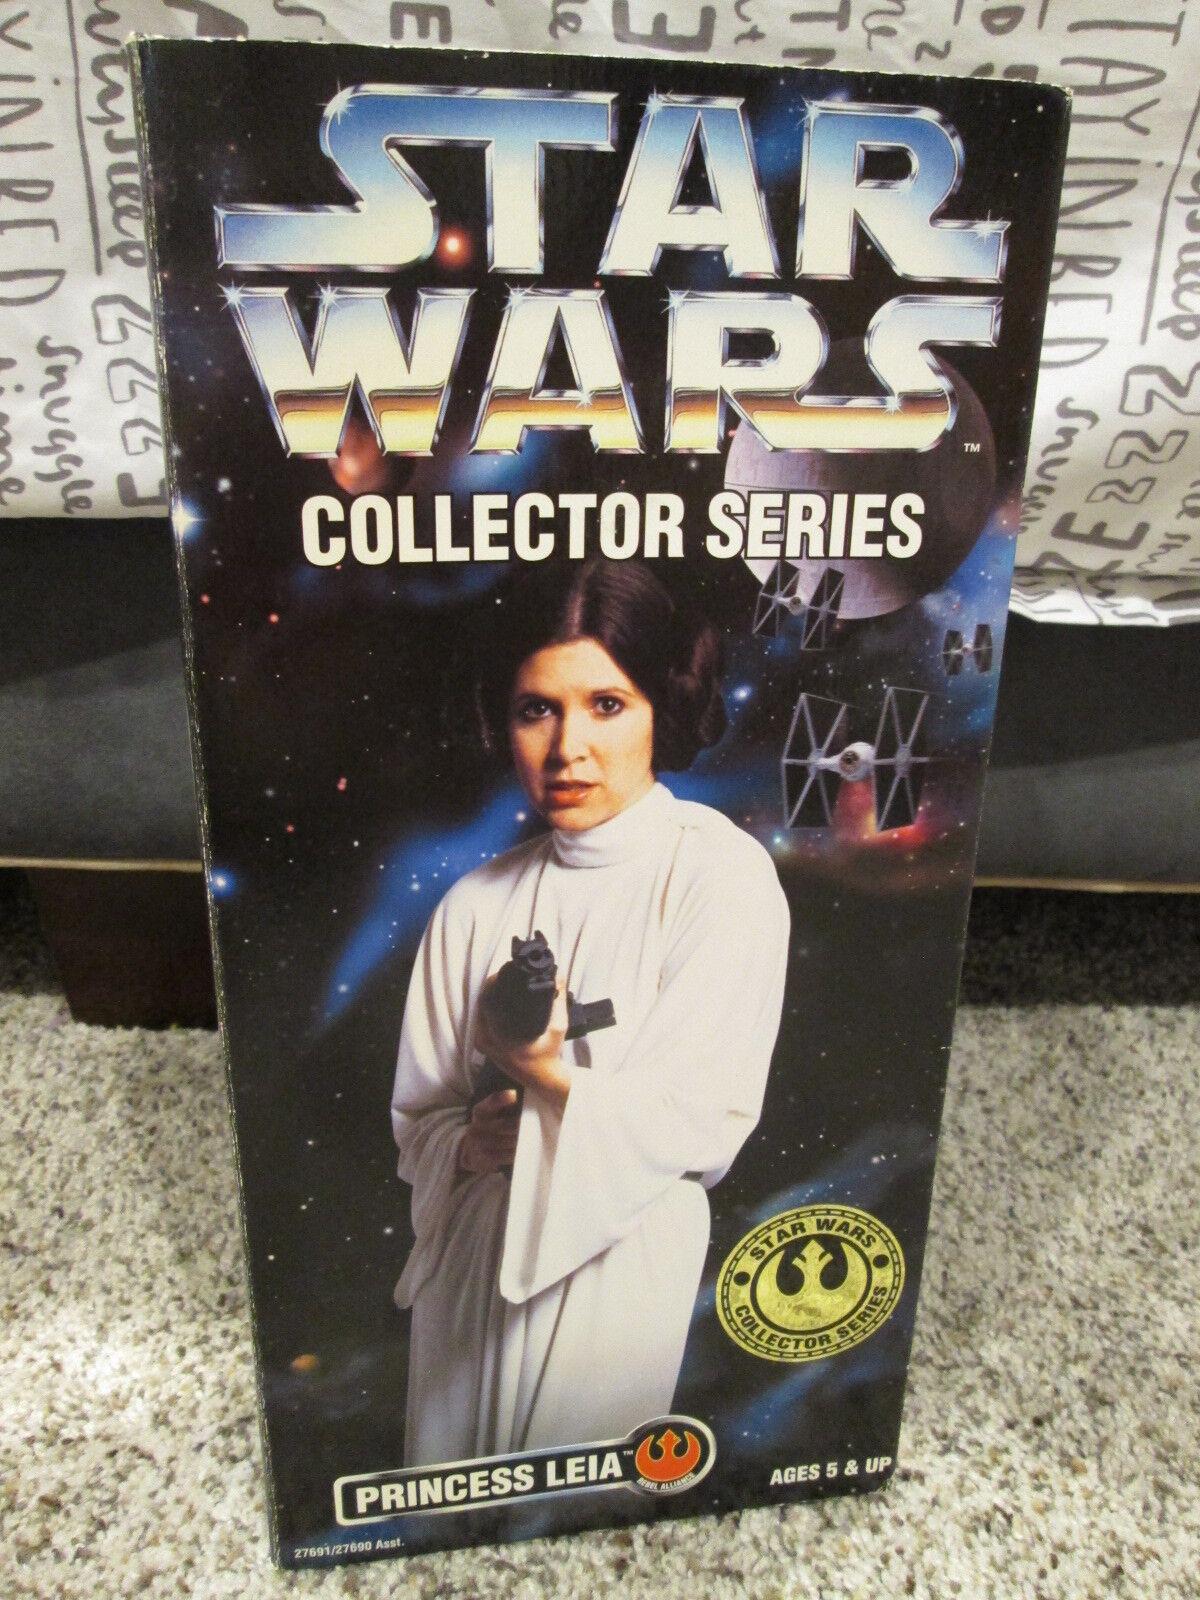 1996 Kenner Star Wars 12  Collector Series Figure Princess Leia 27691 NIB